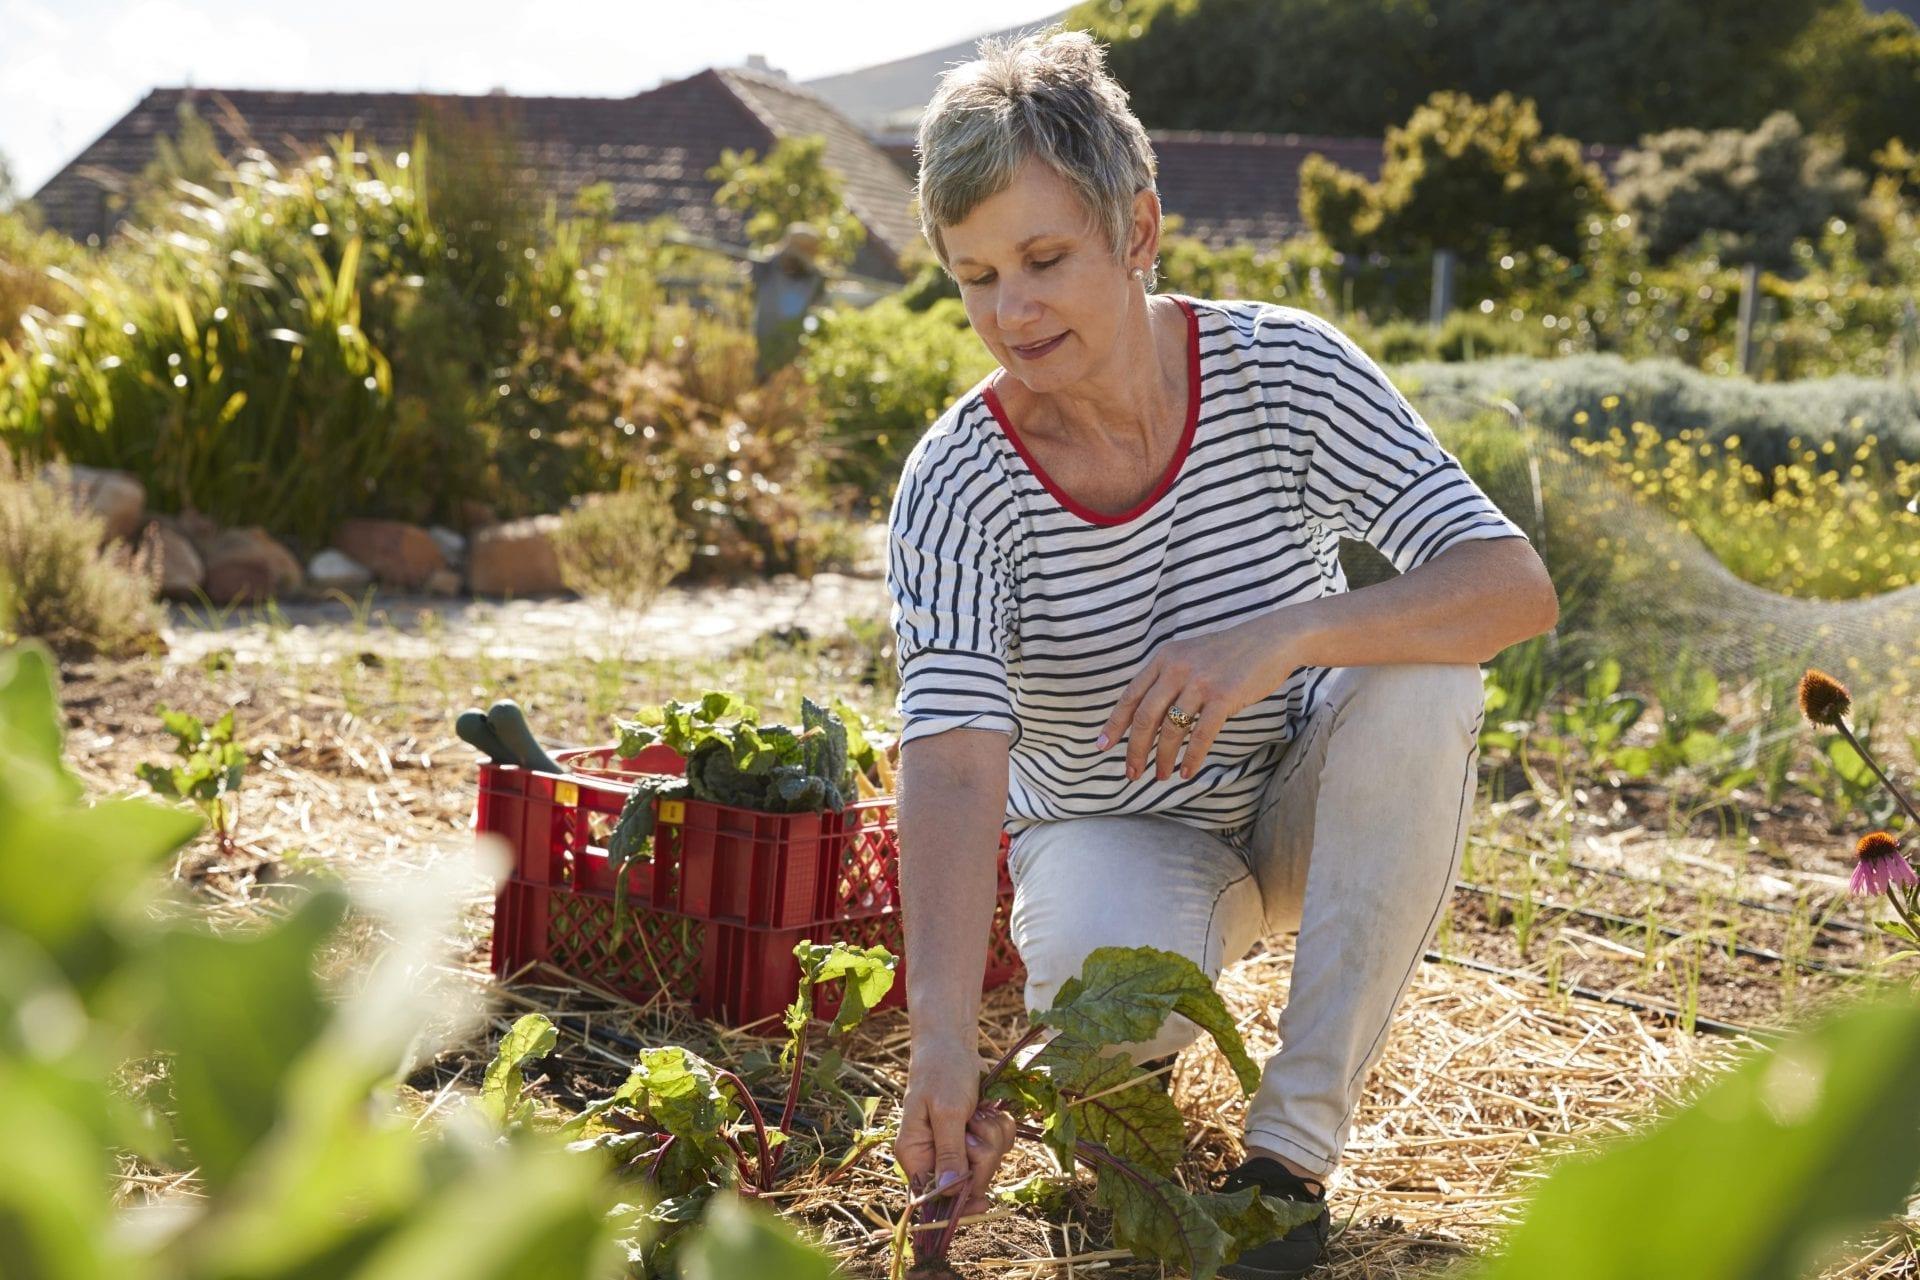 mature-woman-harvesting-beetroot-on-community-PWLYNTZ-min